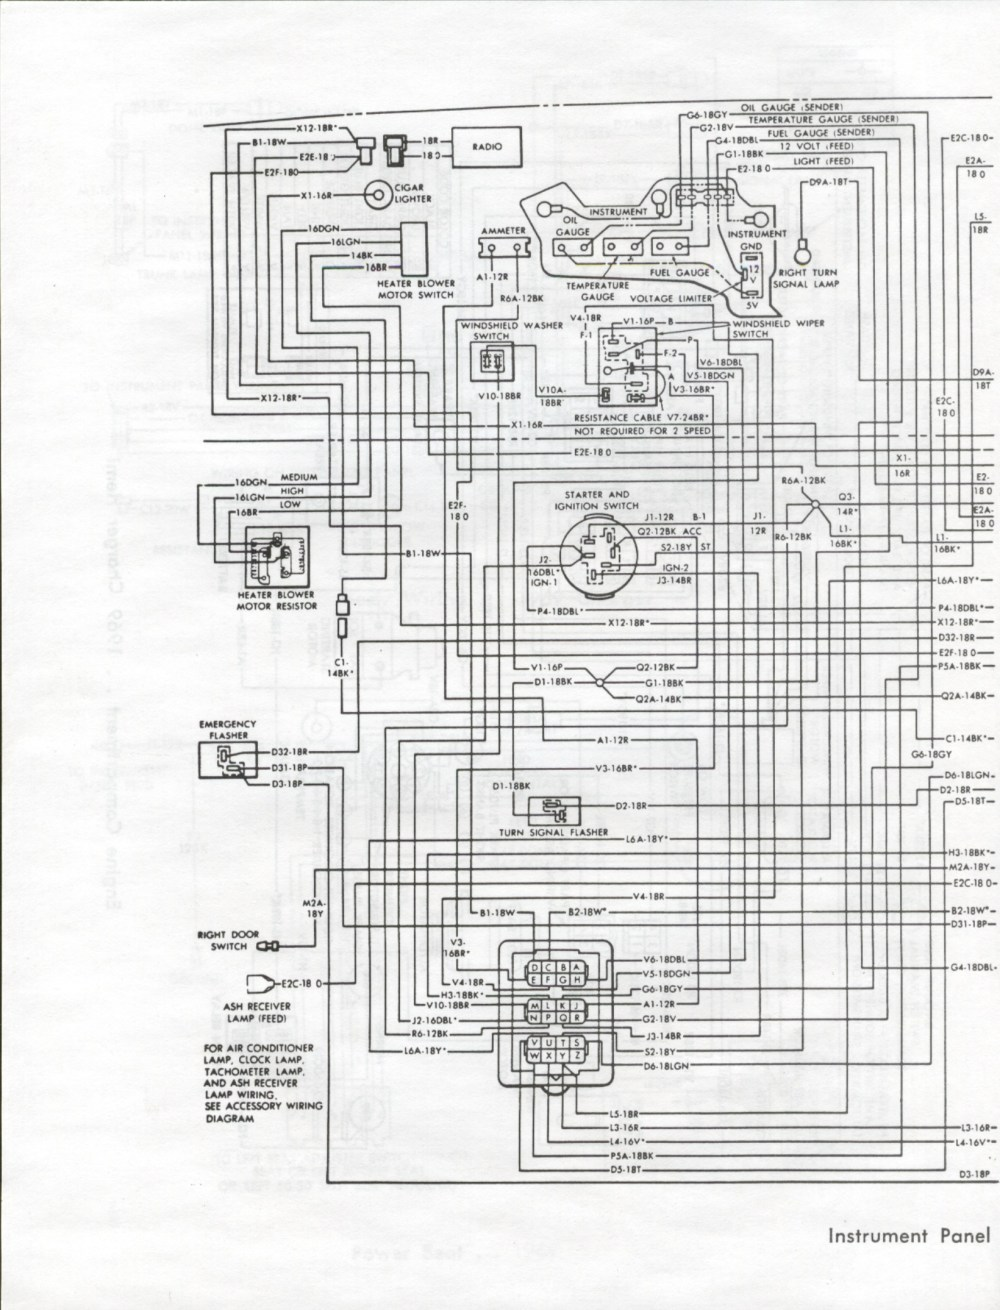 medium resolution of instrument panel 2 of 2